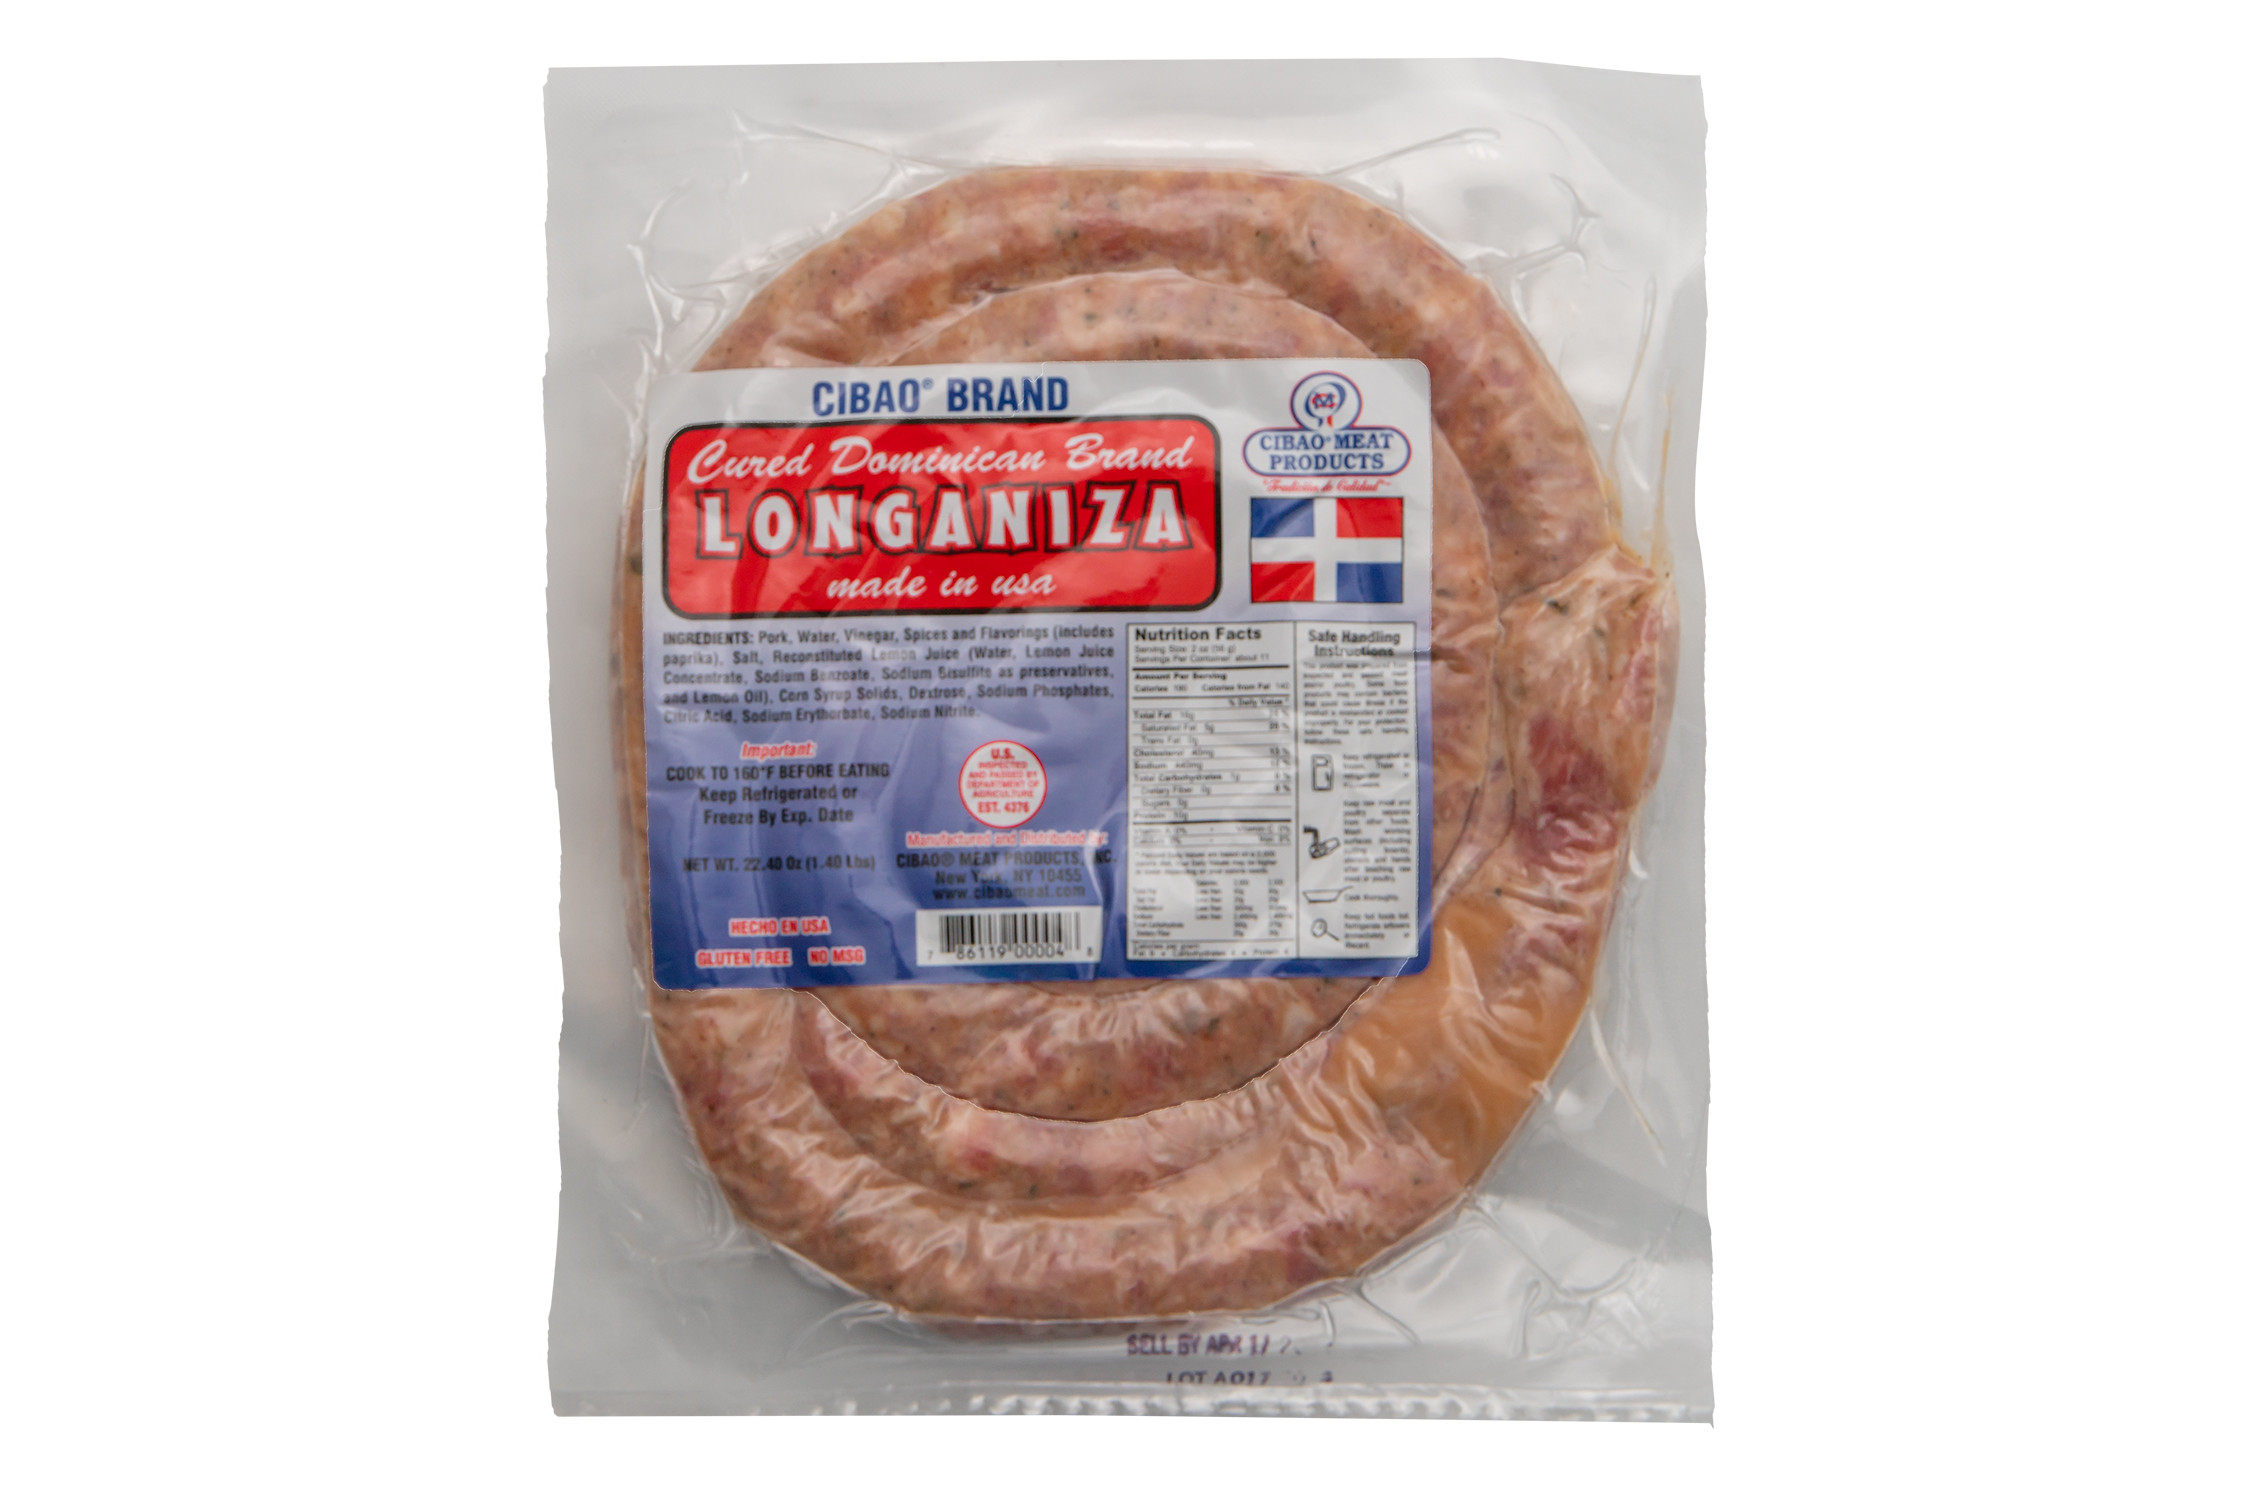 Longania